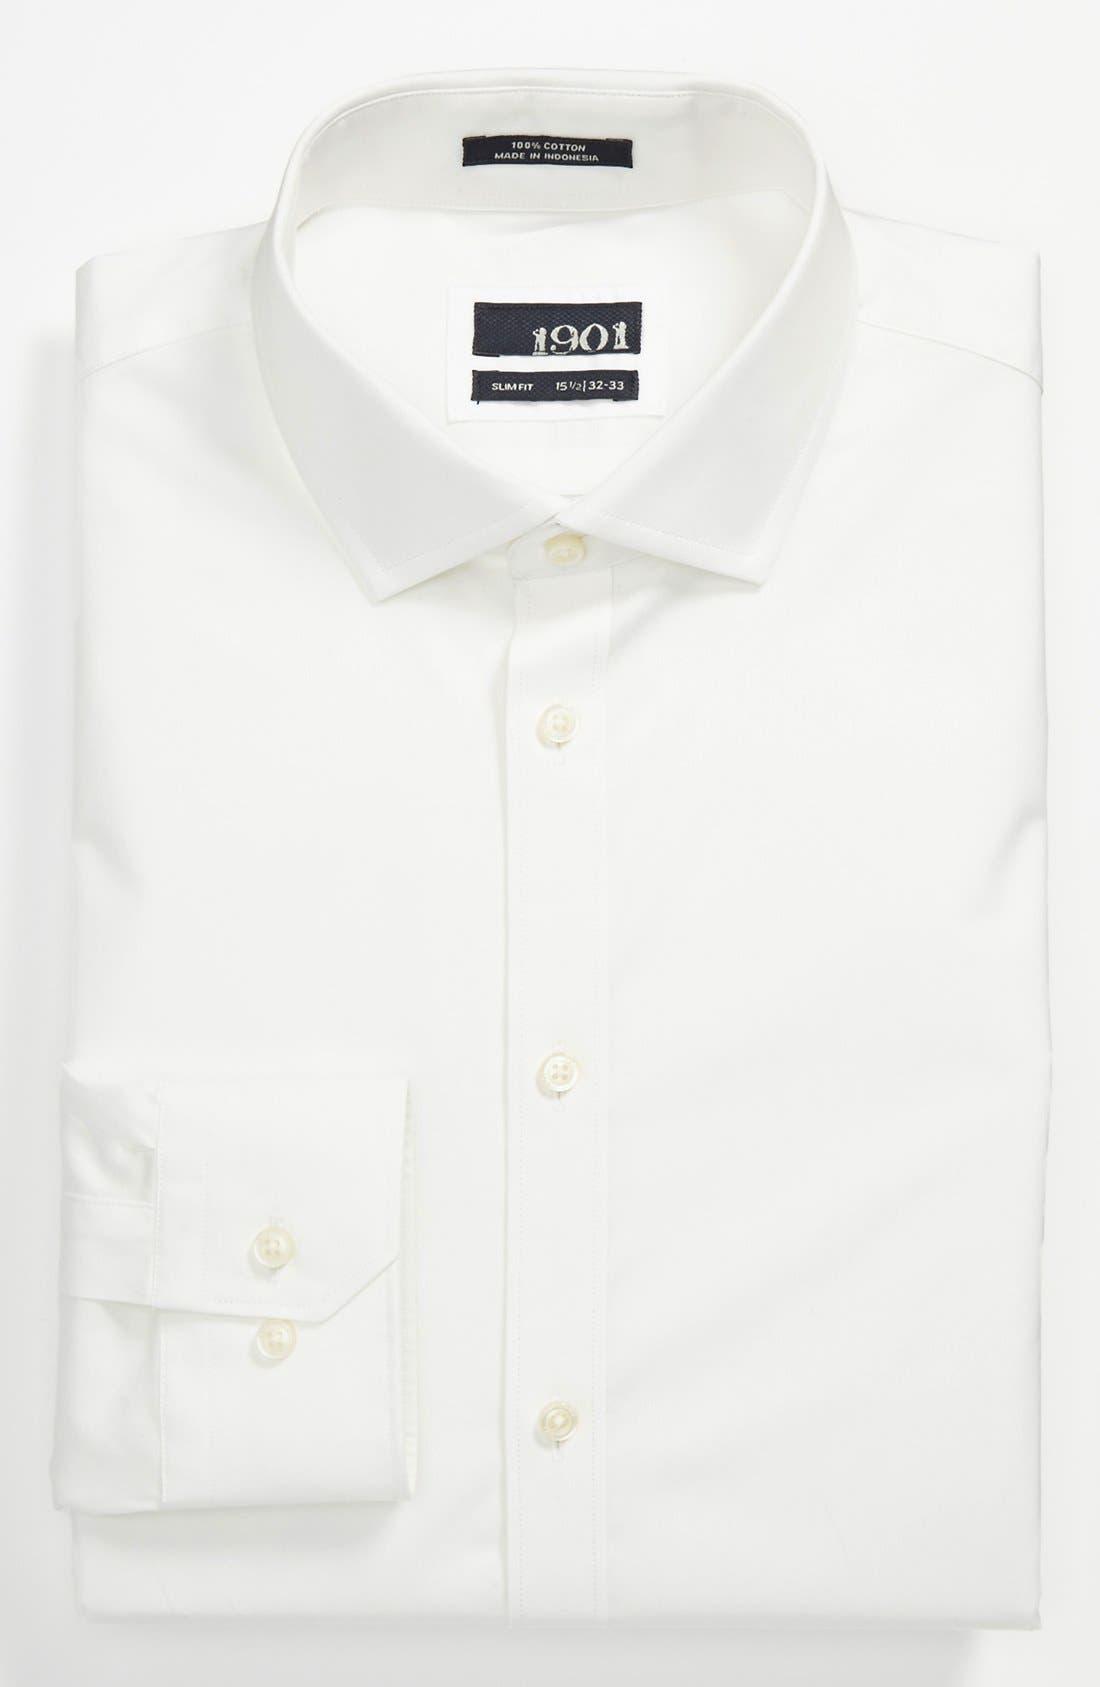 Main Image - 1901 Slim Fit Cotton Dress Shirt